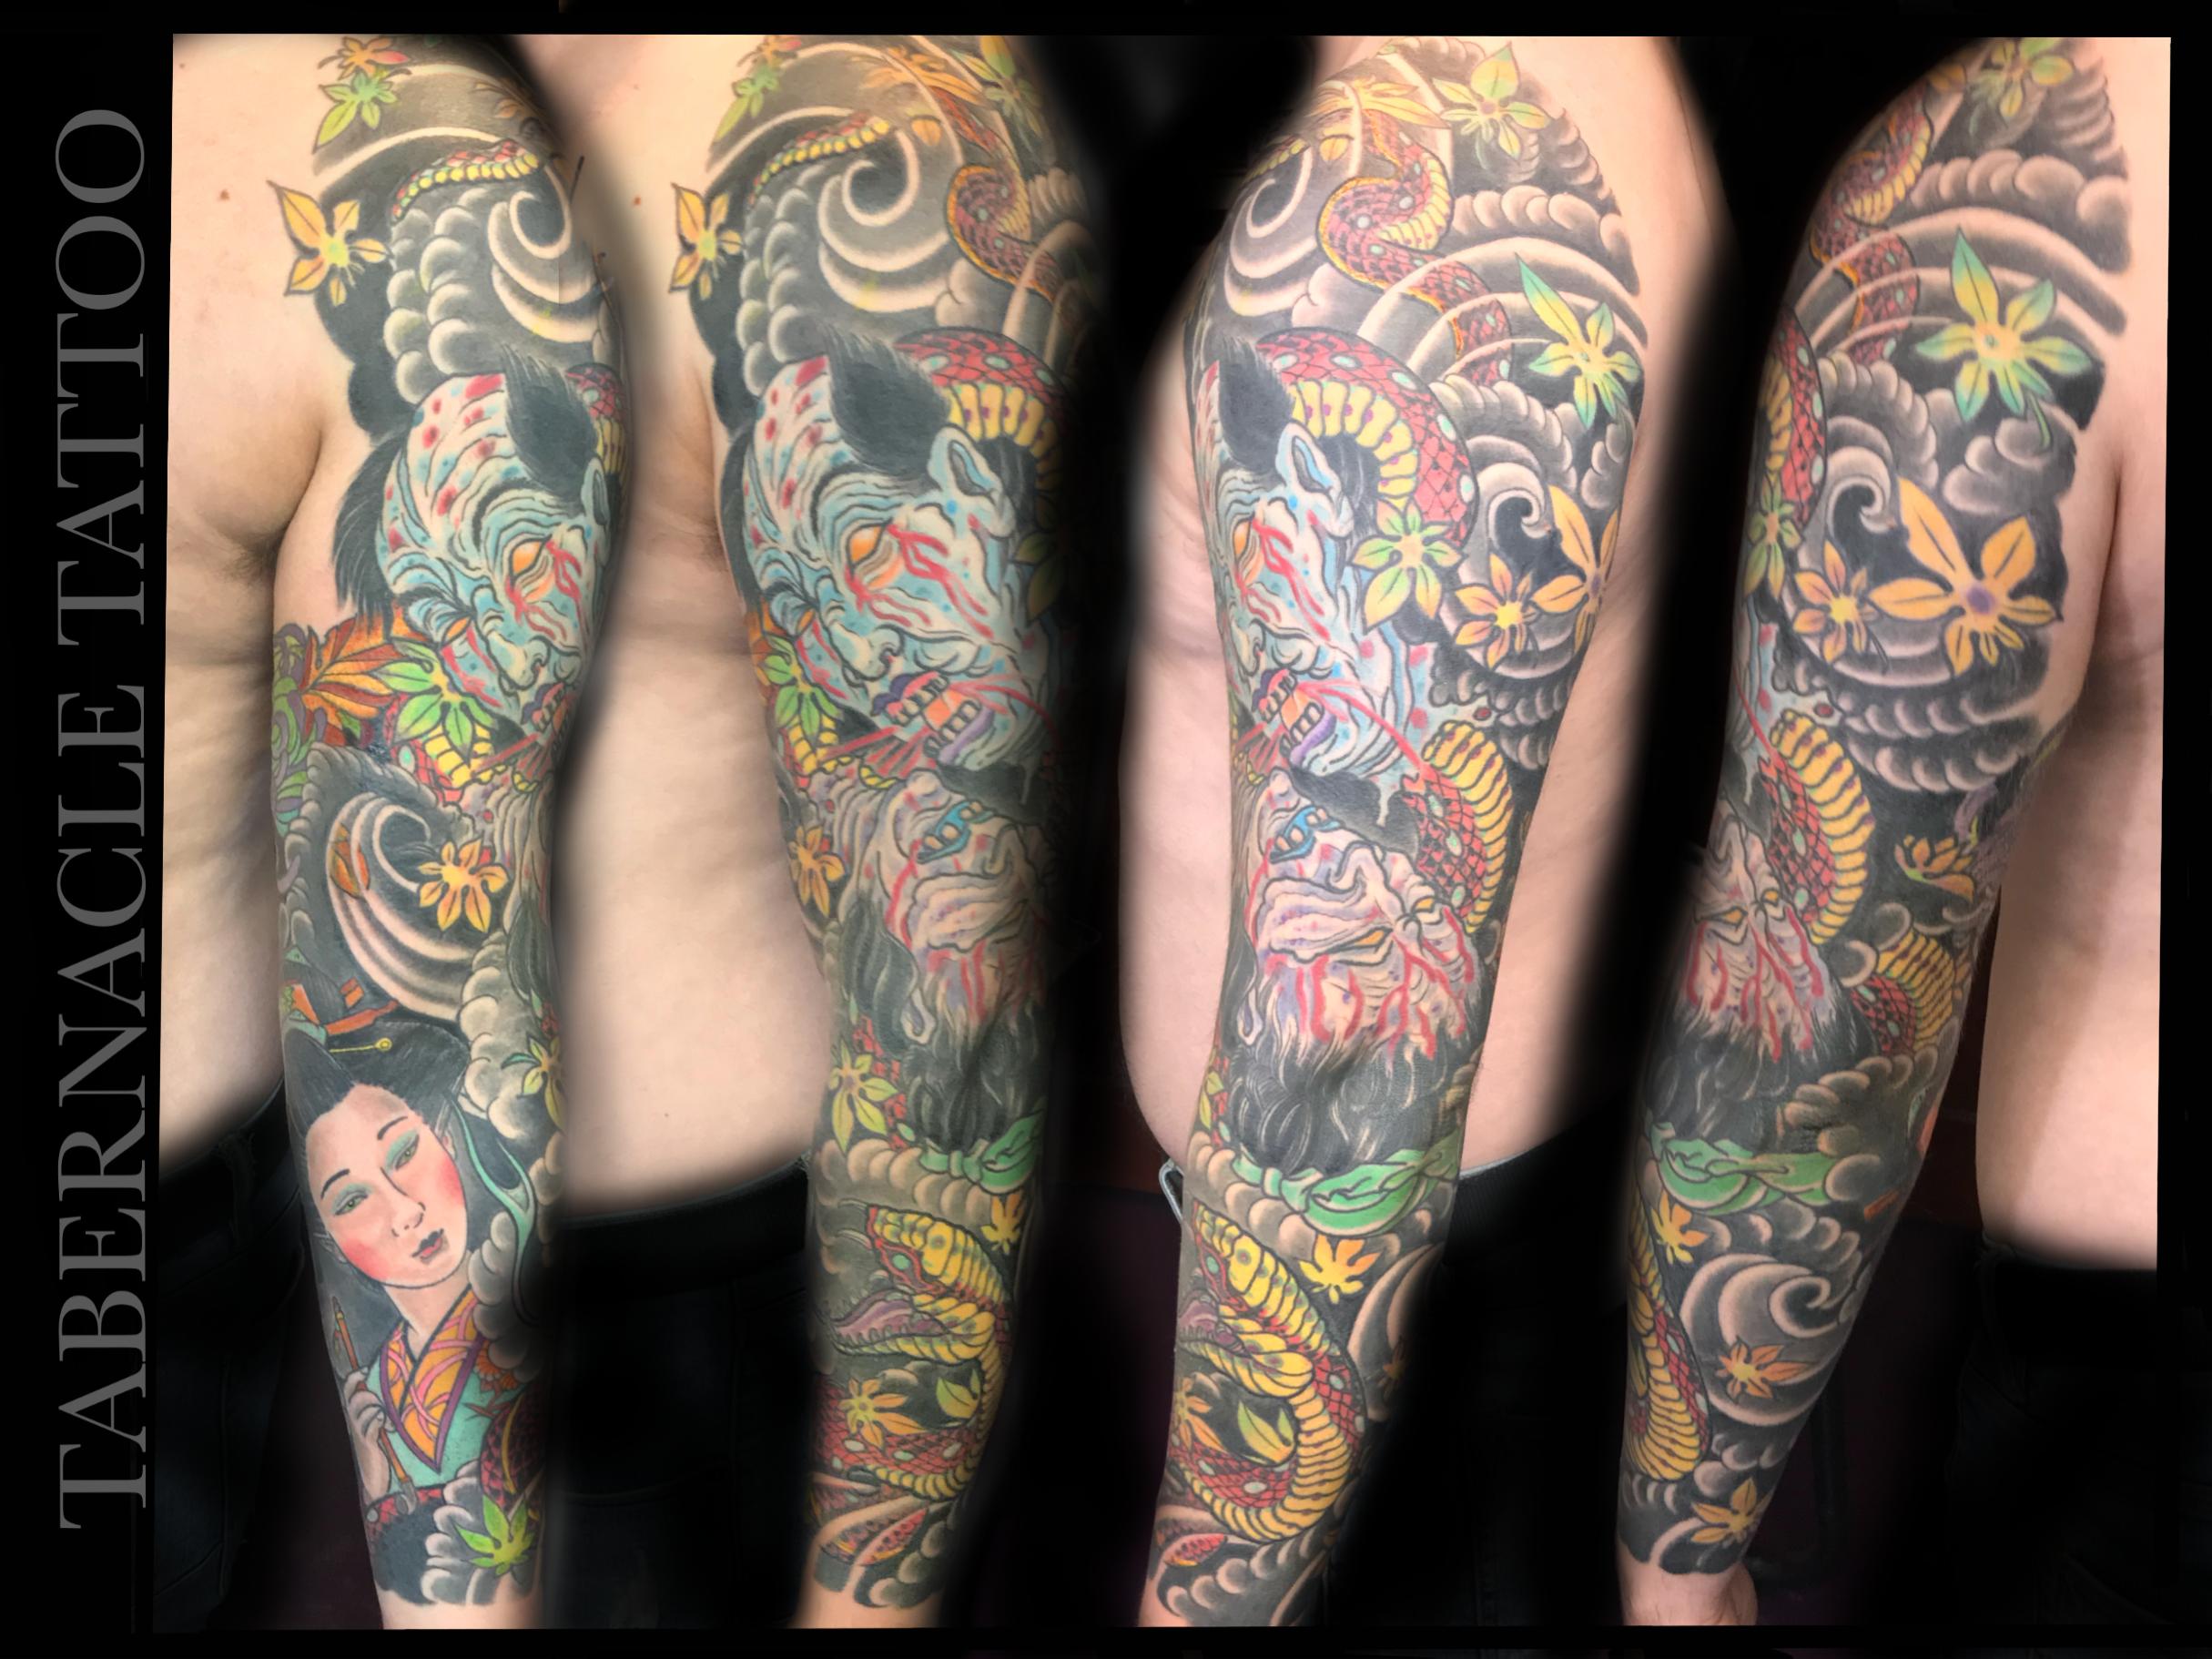 Japanese Namakubi tattoo  irezumi  also known as a severed head  Japanese Geisha Tattoo